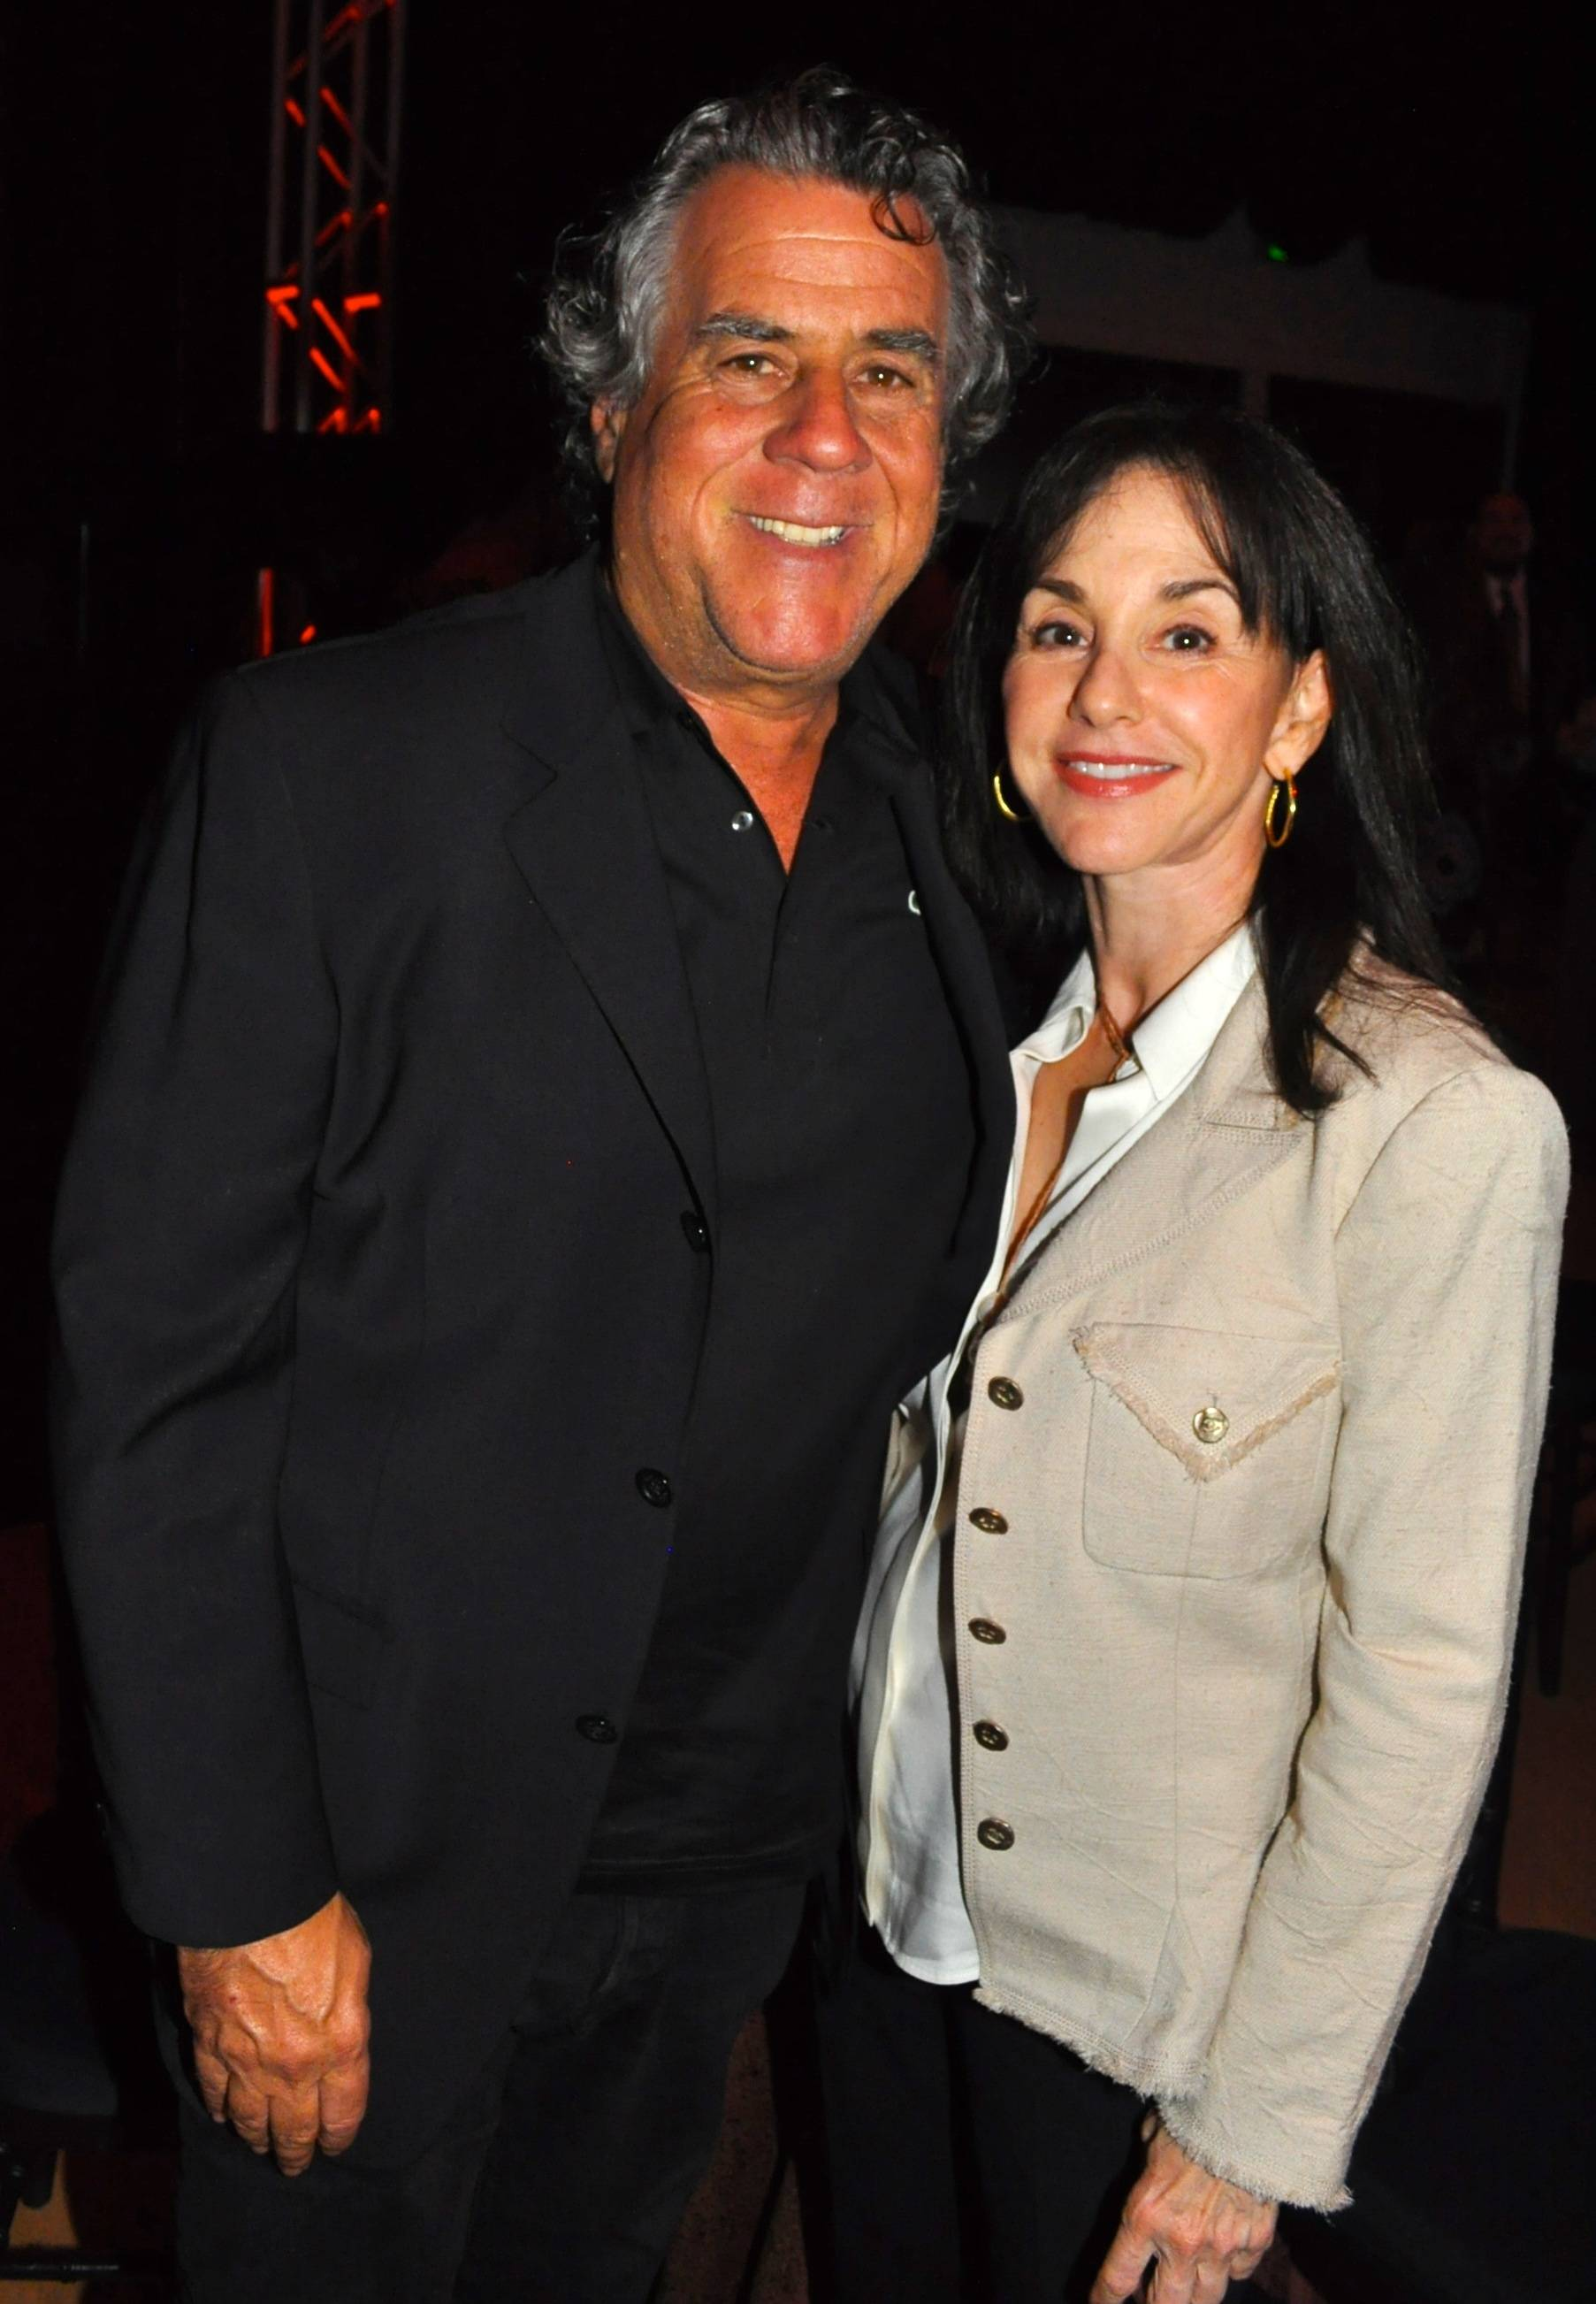 1) Alan and Diane Lieberman